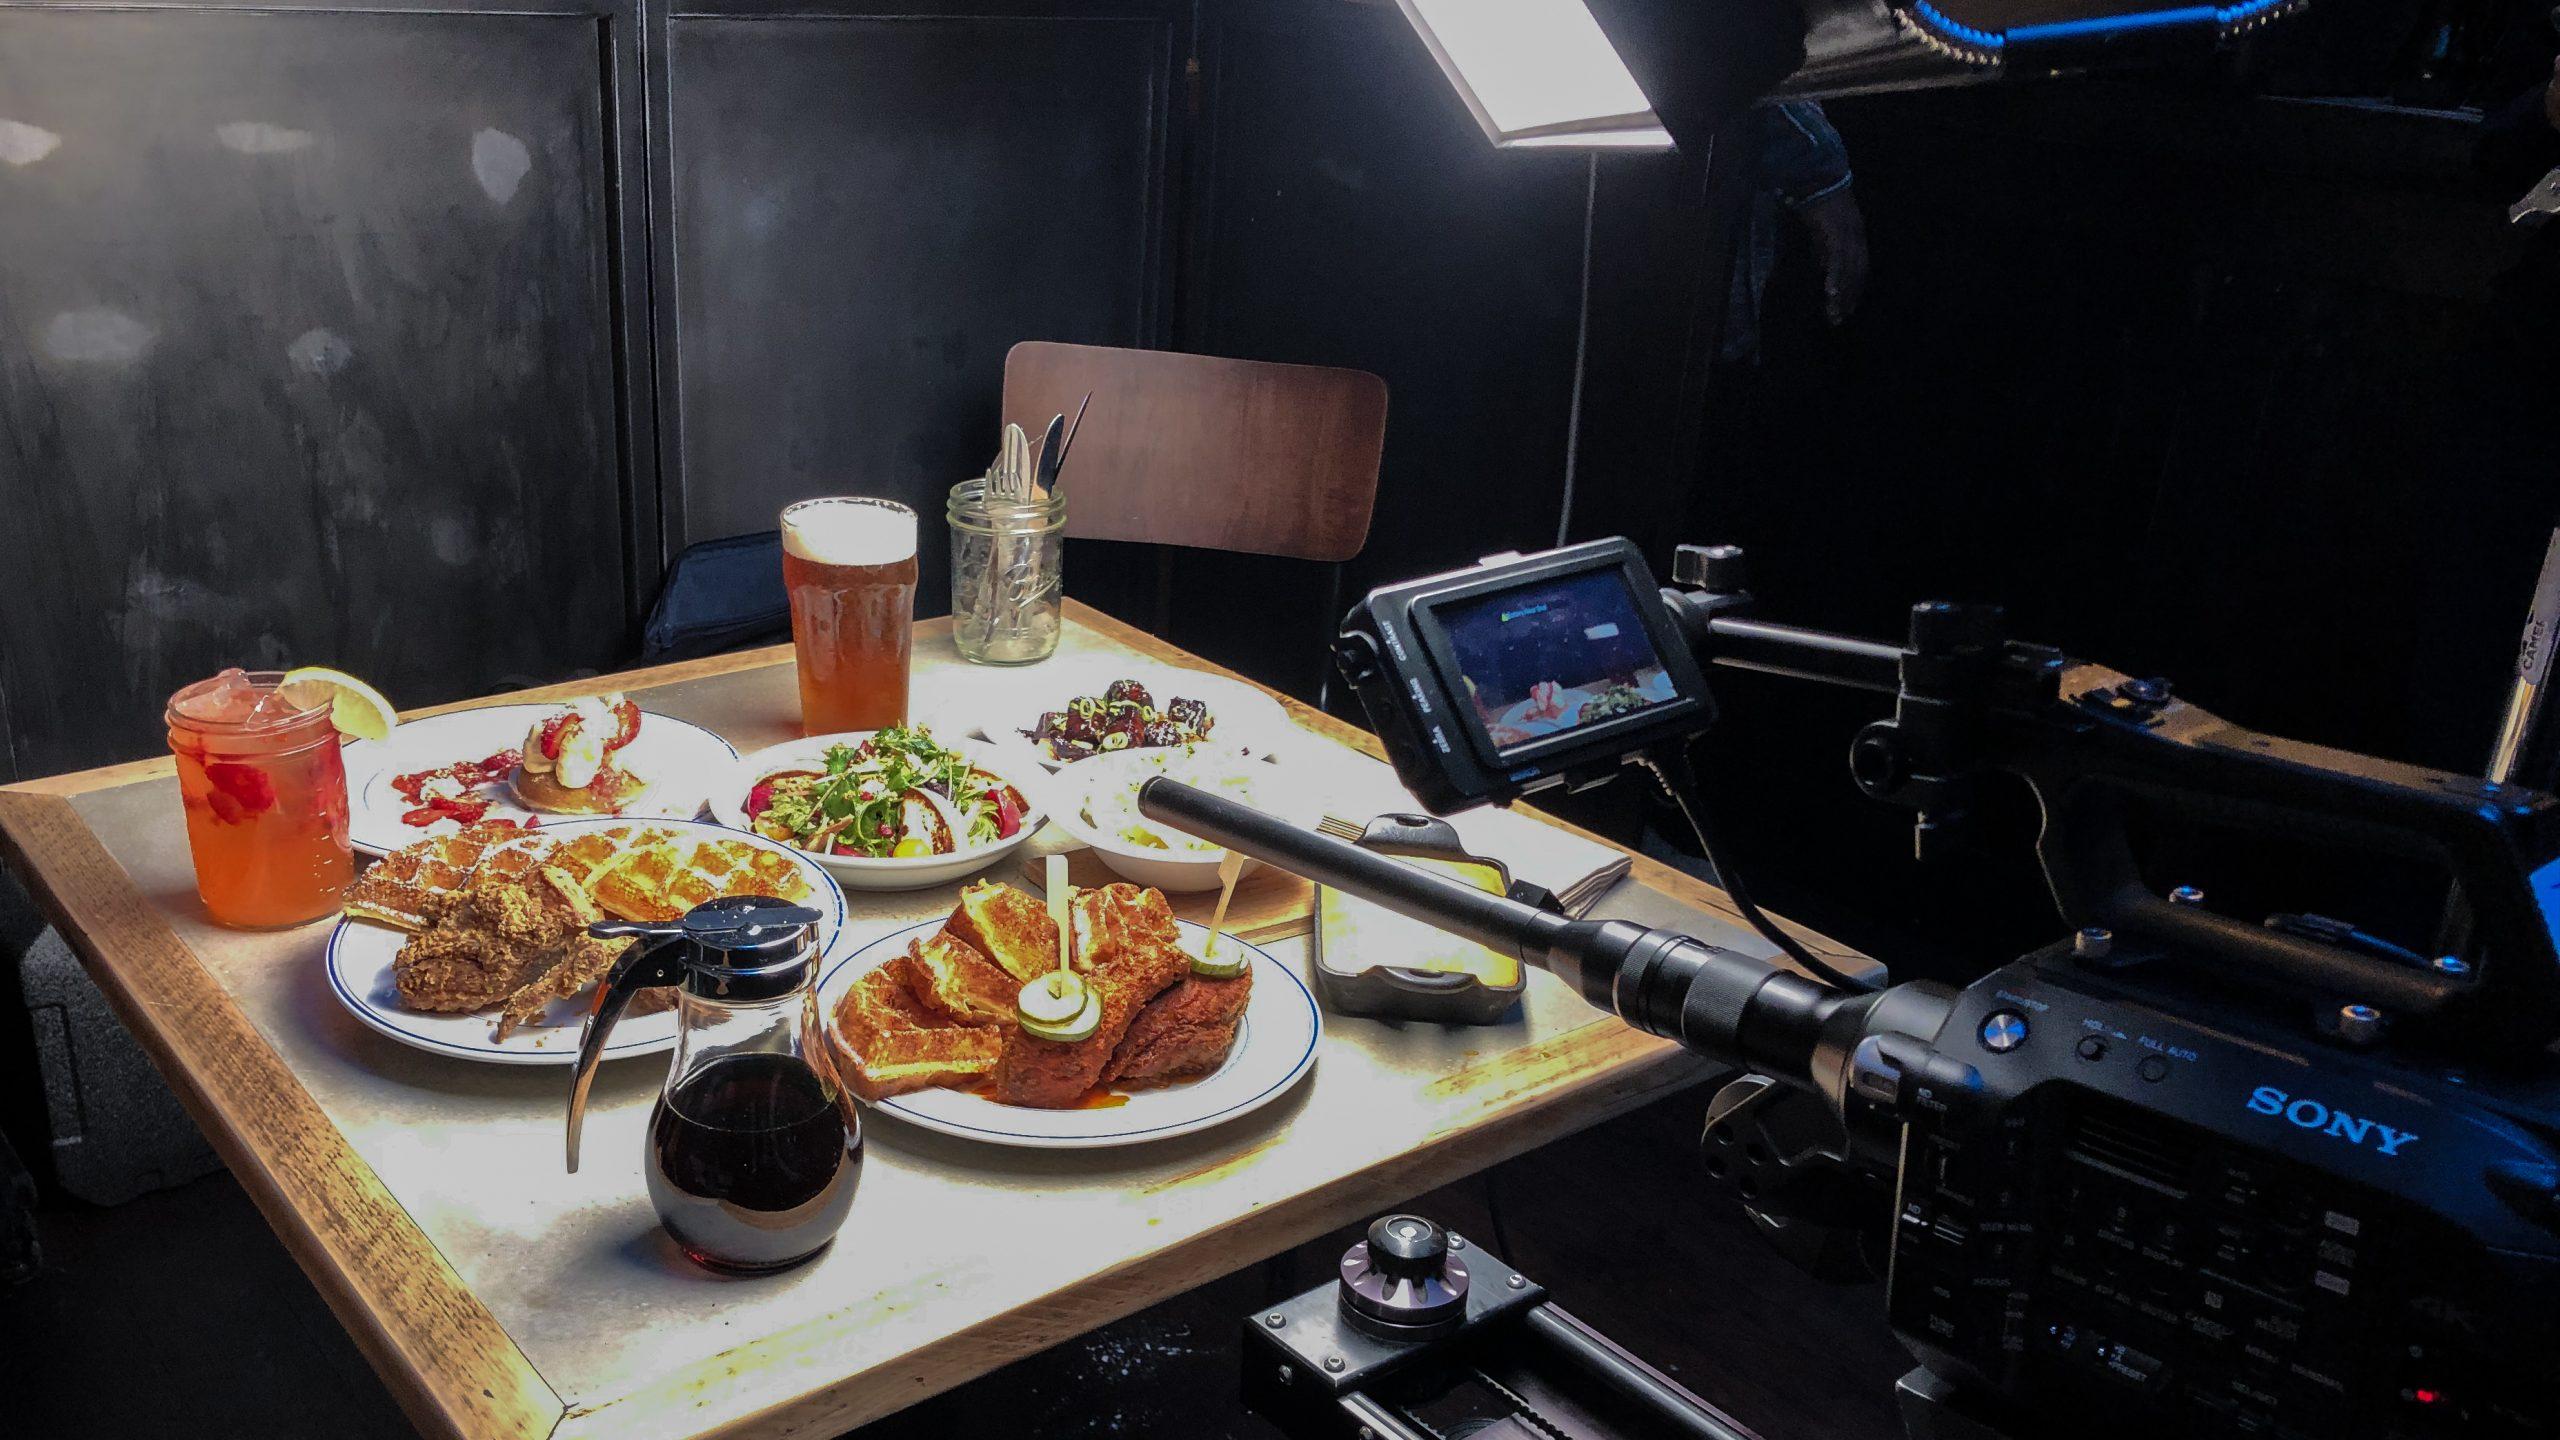 food being filmed